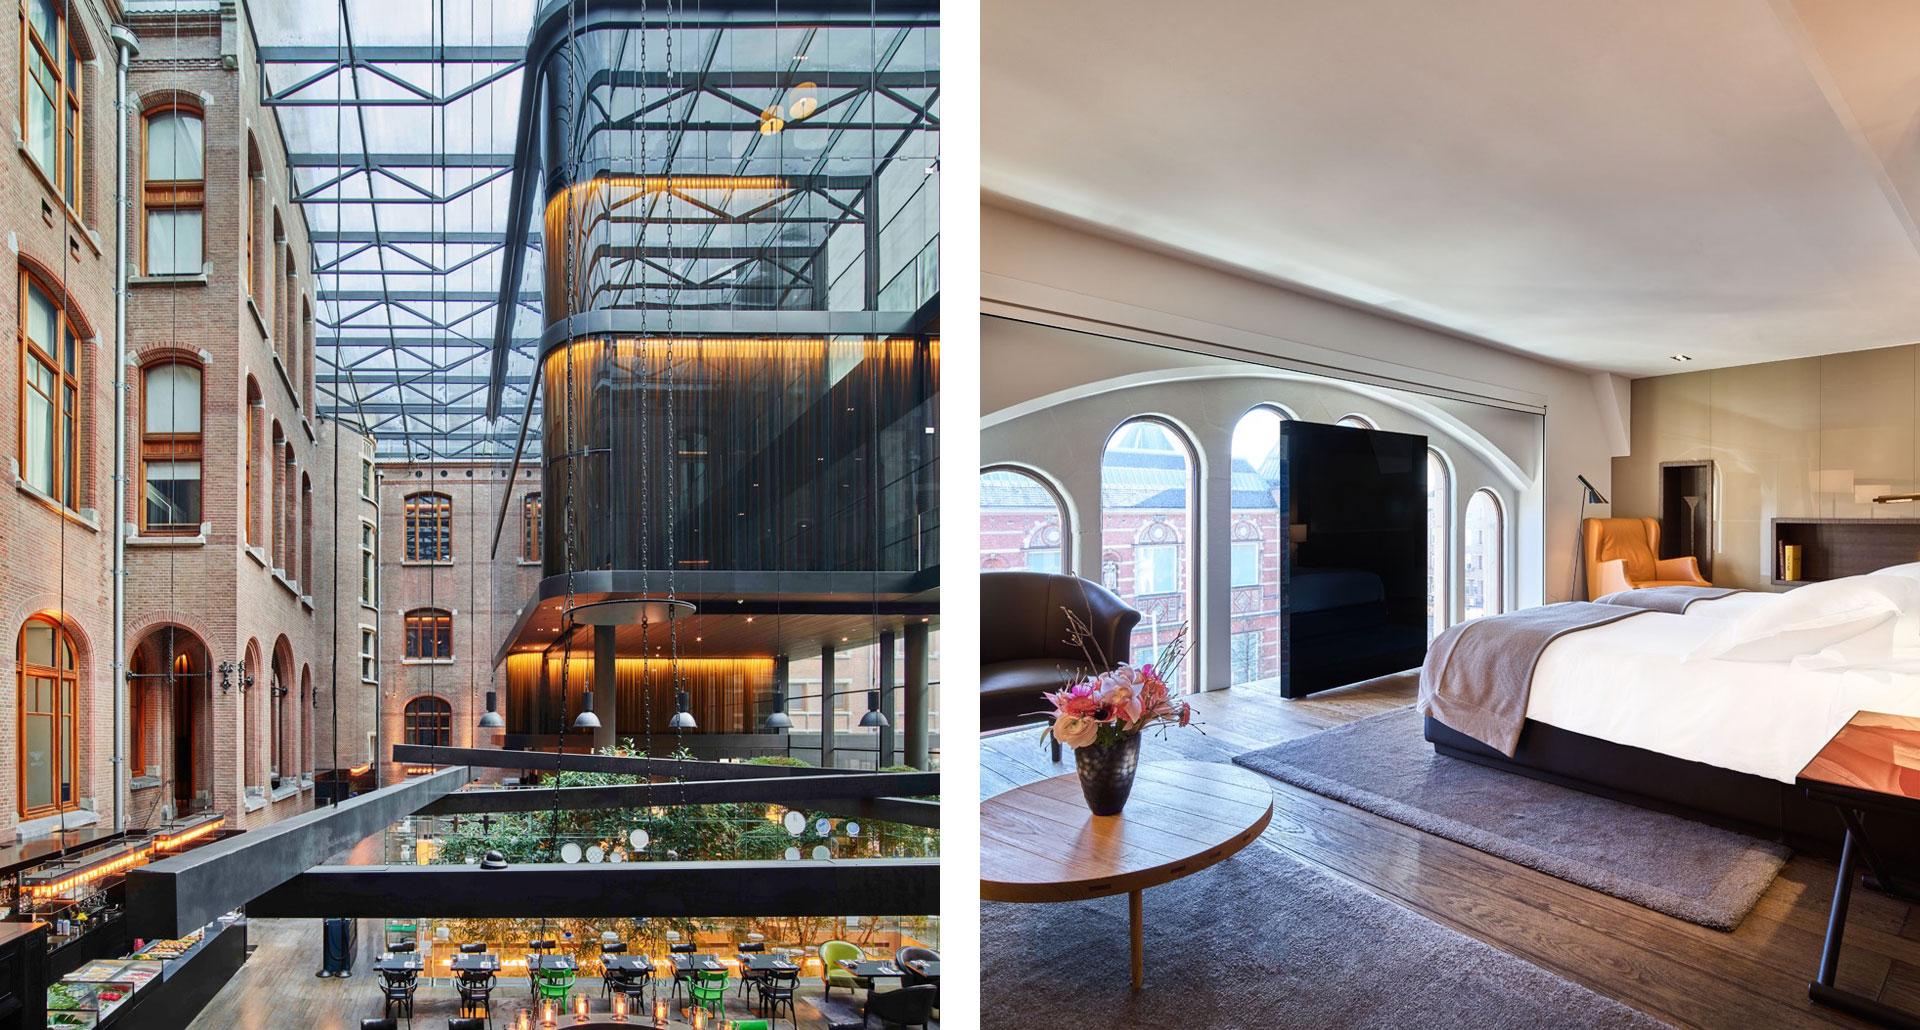 Conservatorium Hotel Amsterdam - boutique hotel in Amsterdam